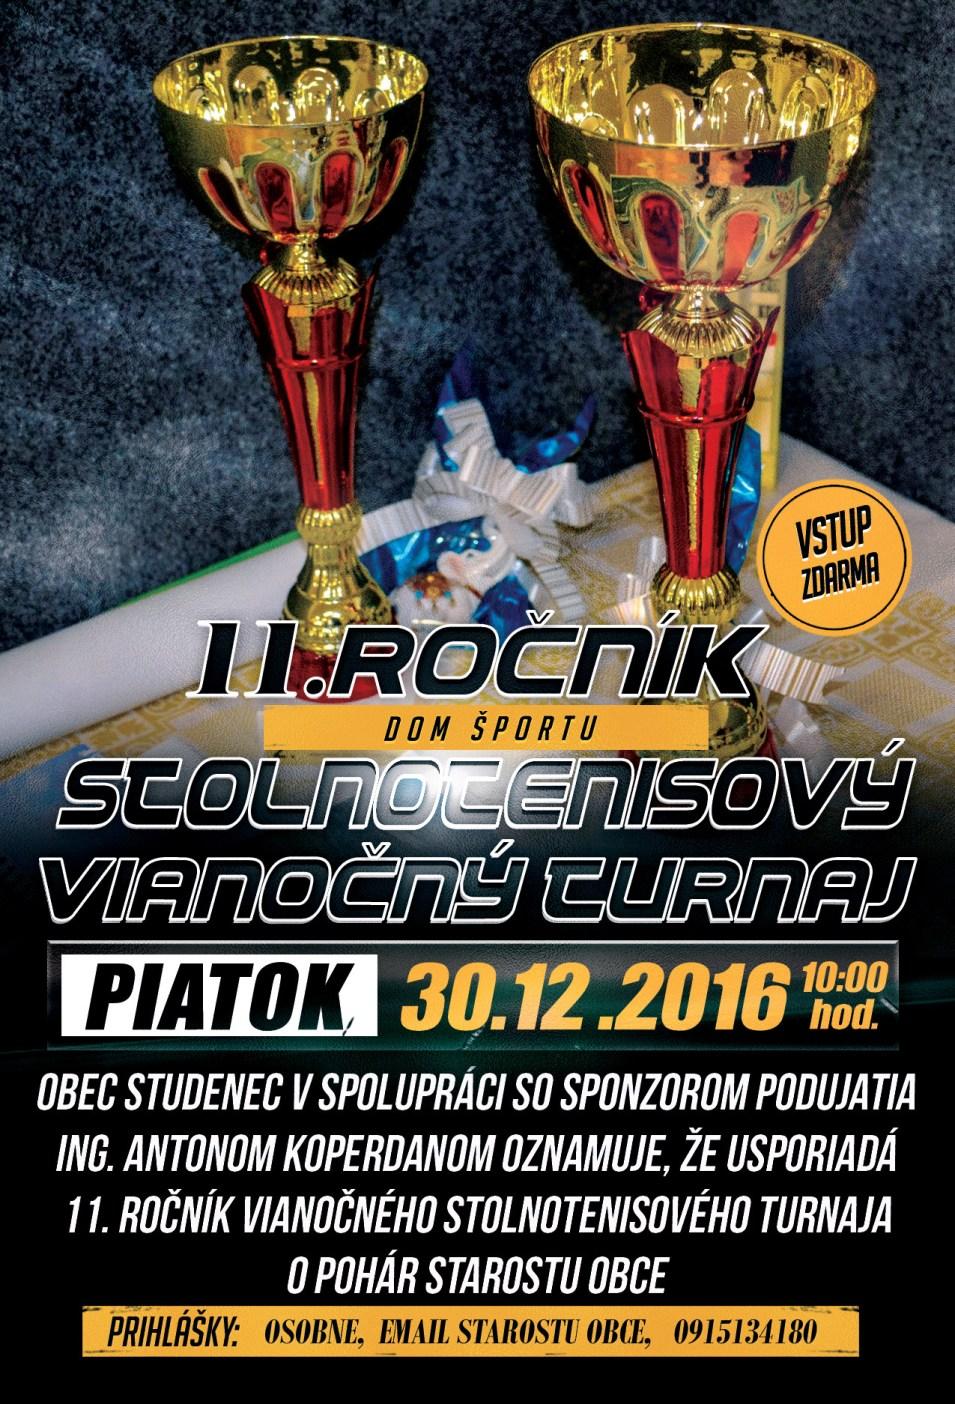 vianocny-turnaj-2016